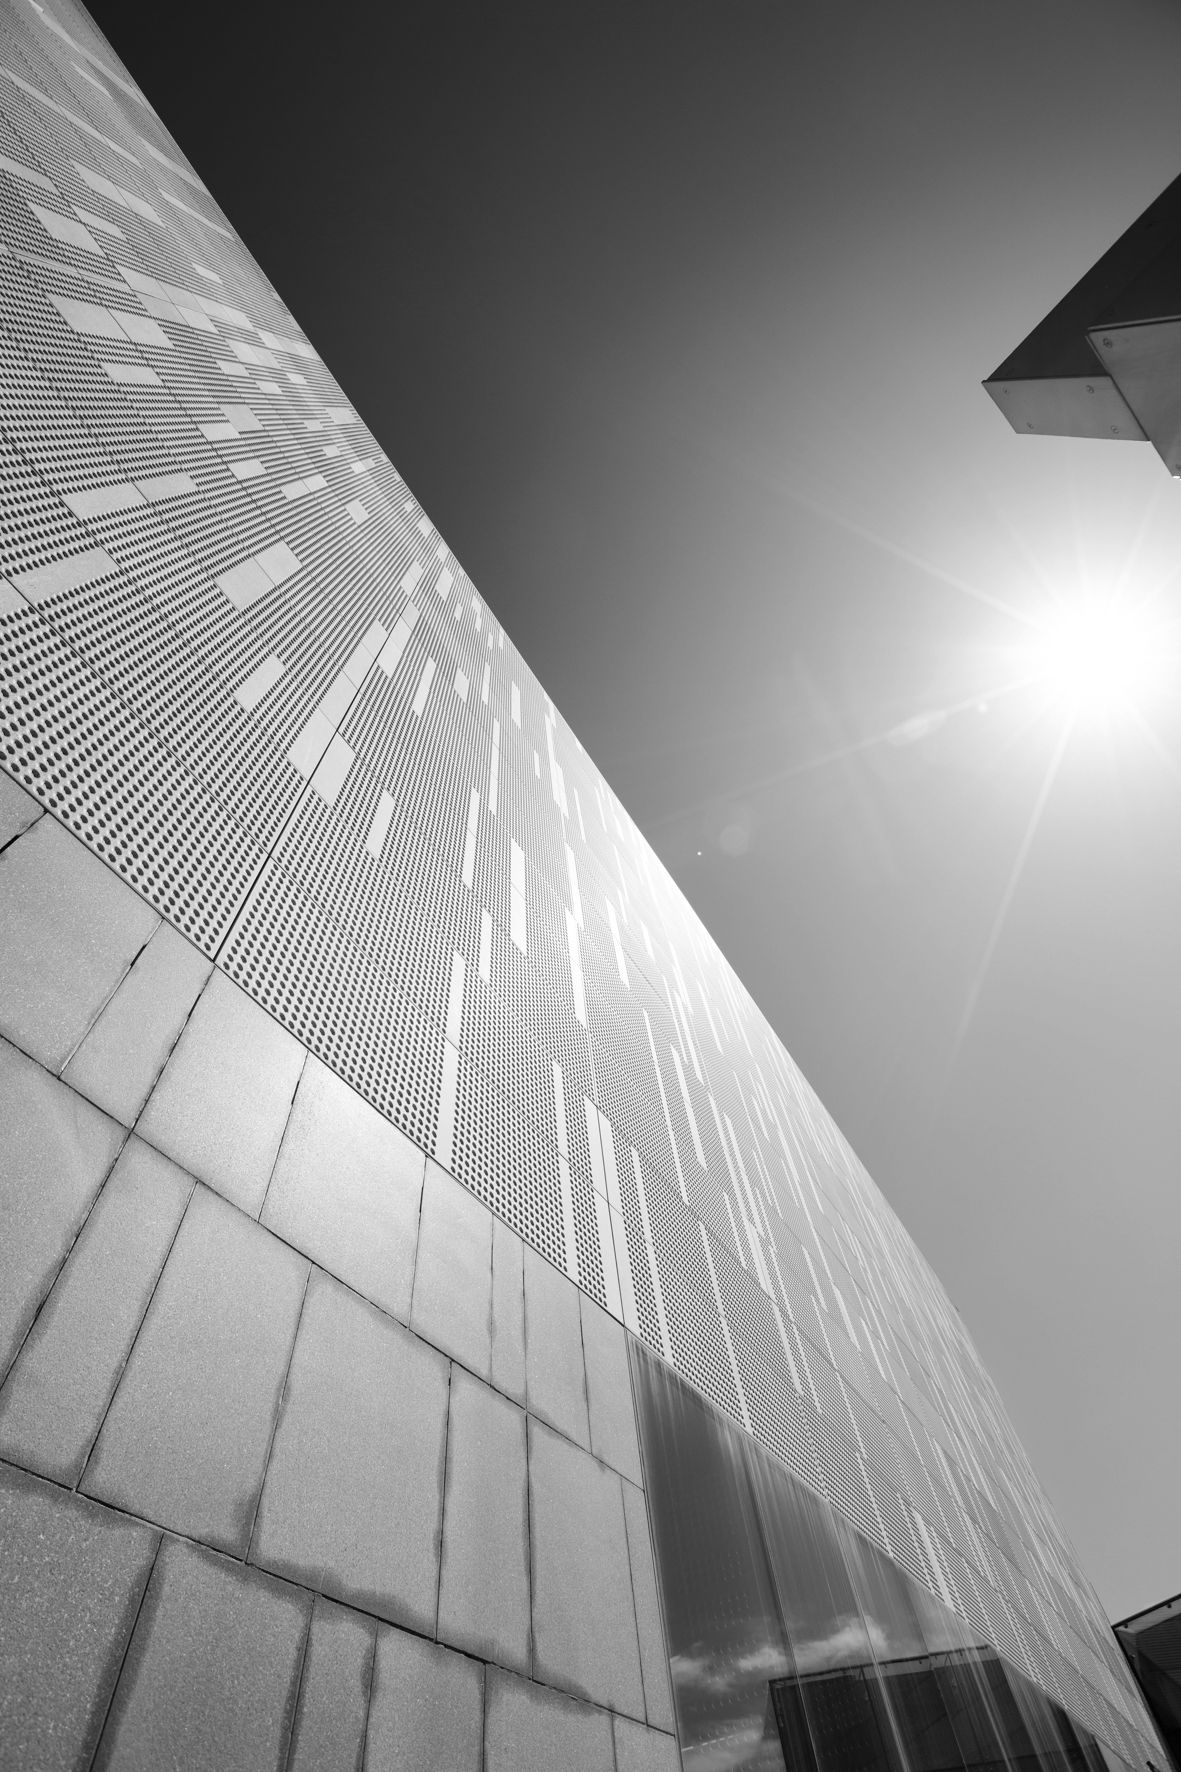 Helsinki Architecture Series ra - alexreigworks | ello